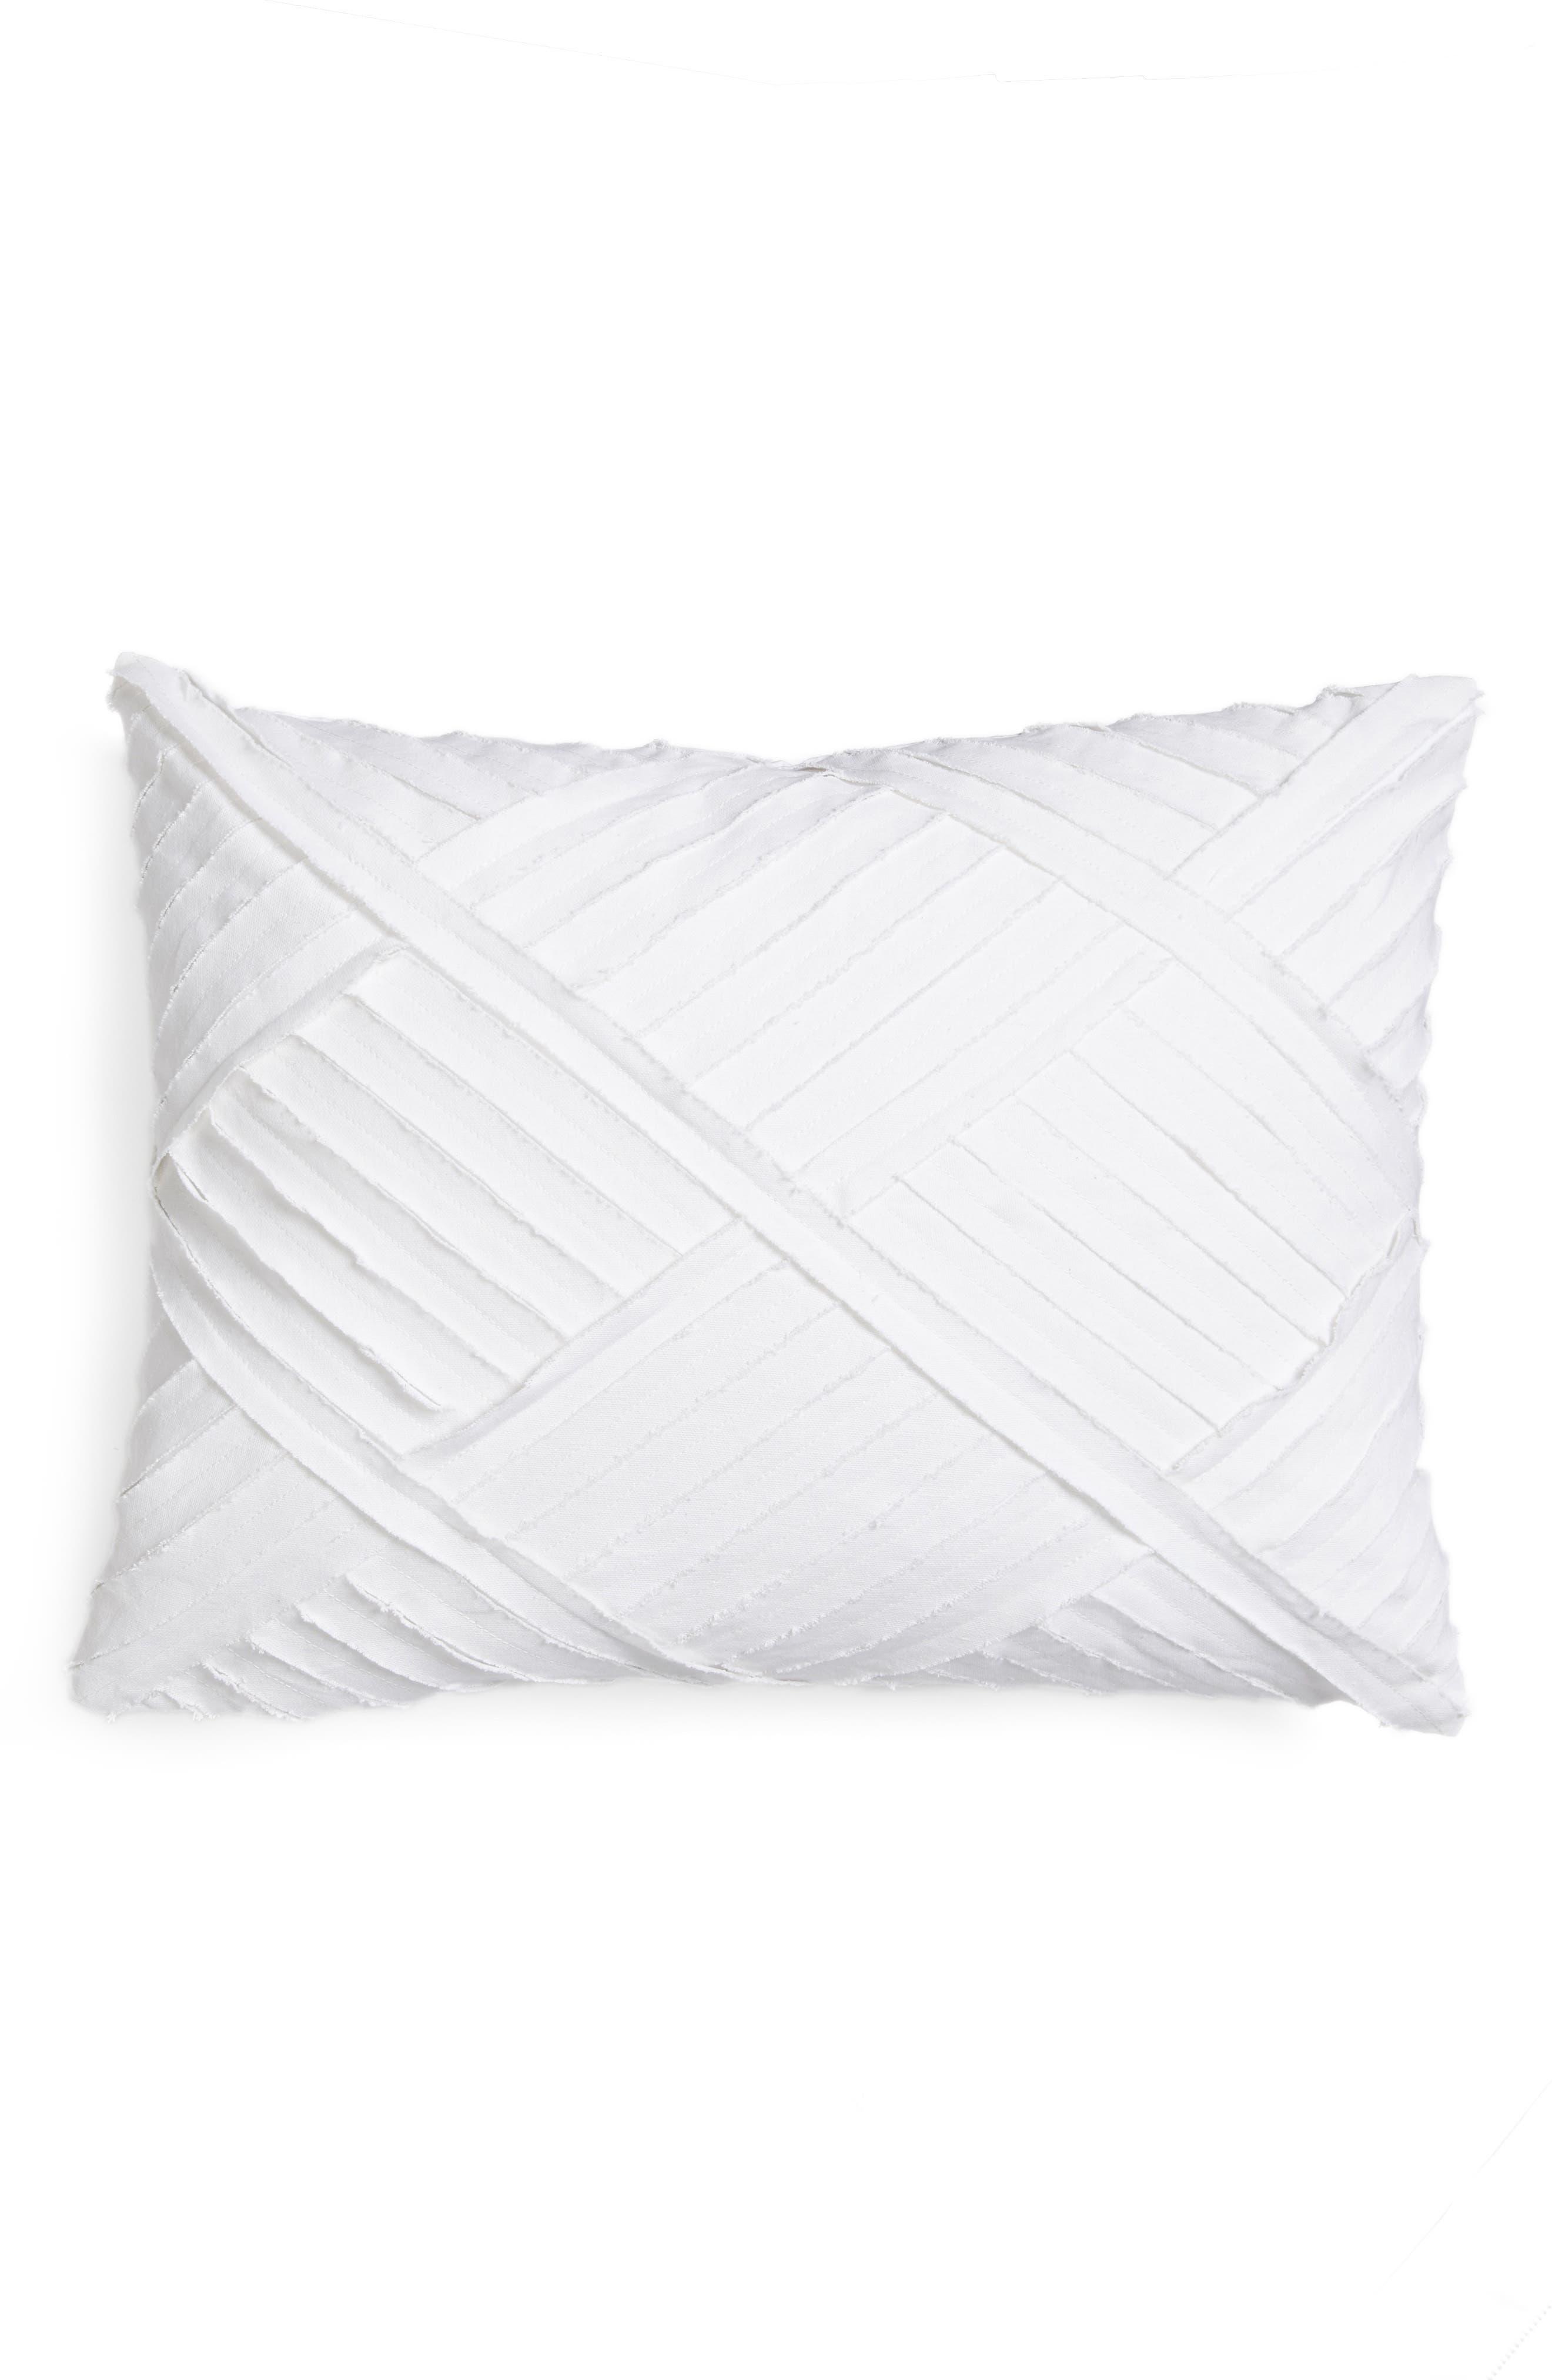 Alexandria Accent Pillow,                         Main,                         color, 100